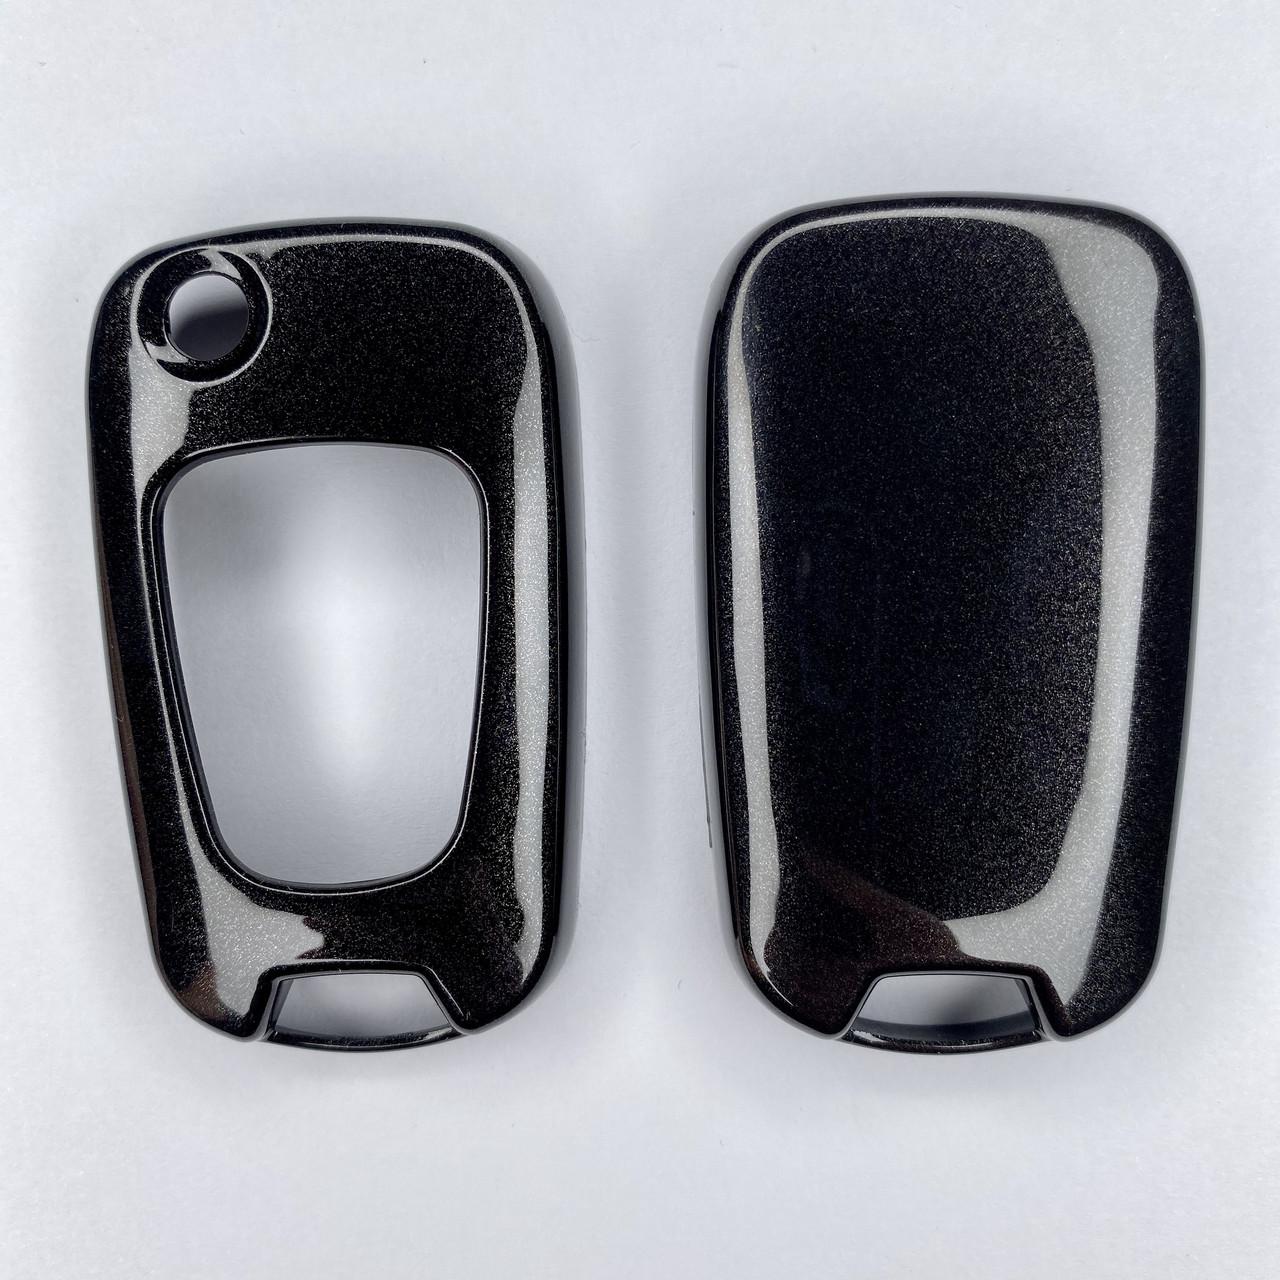 Пластиковый чехол  для ключа Hyundai i10,i20,i40,Accent,Elantra,Sonata Tucson,Santa Fe,VERNA,Genesis Getz,IX35